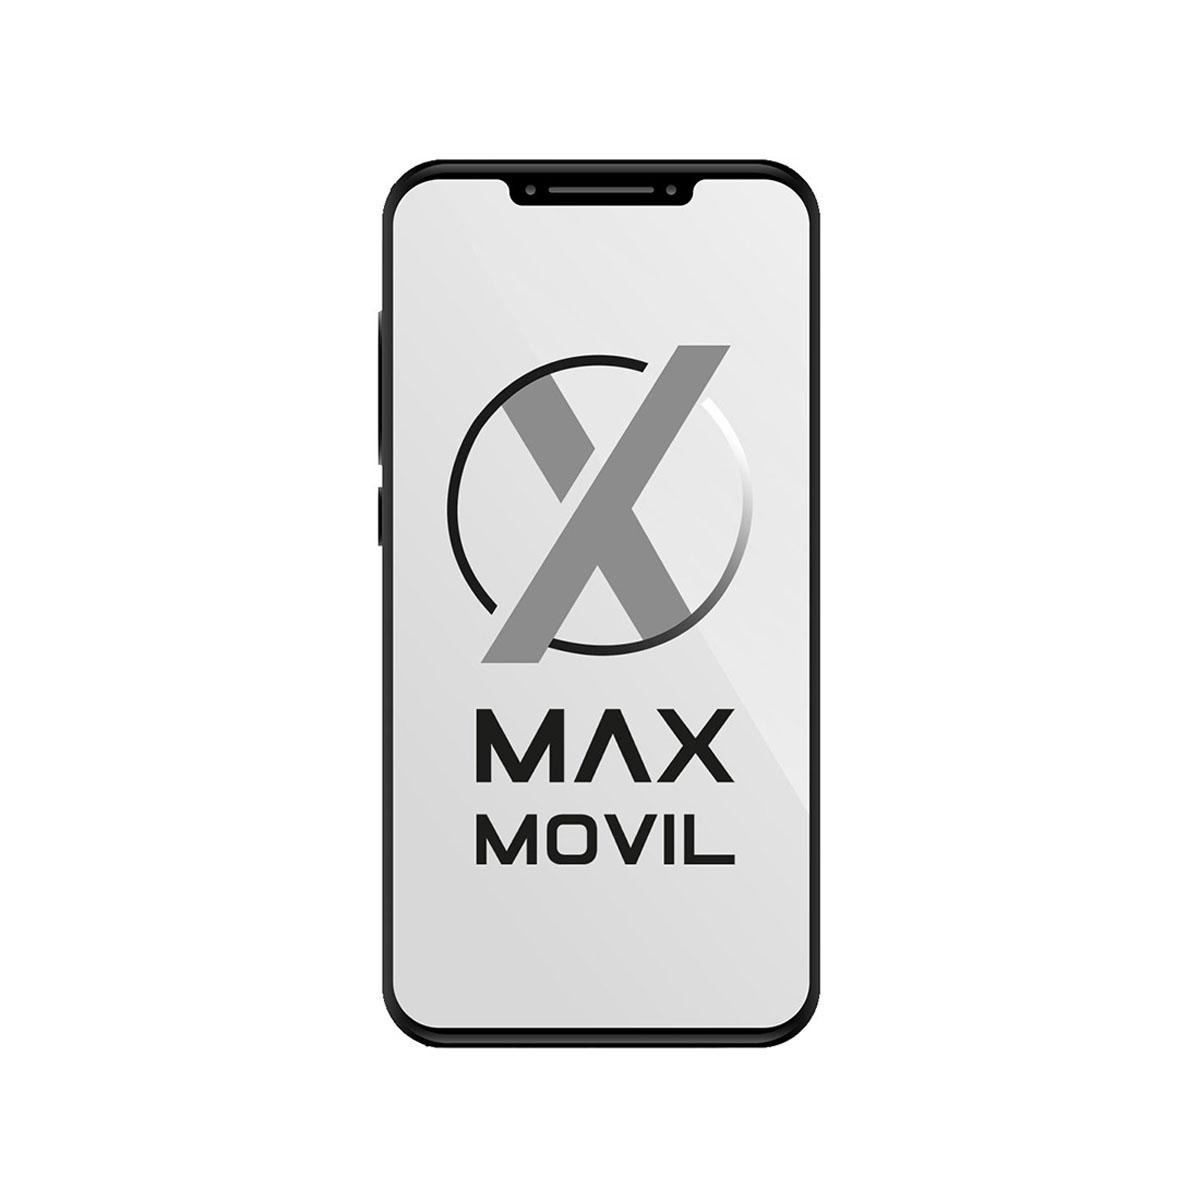 Protector de pantalla de cristal templado para iPhone X/XS